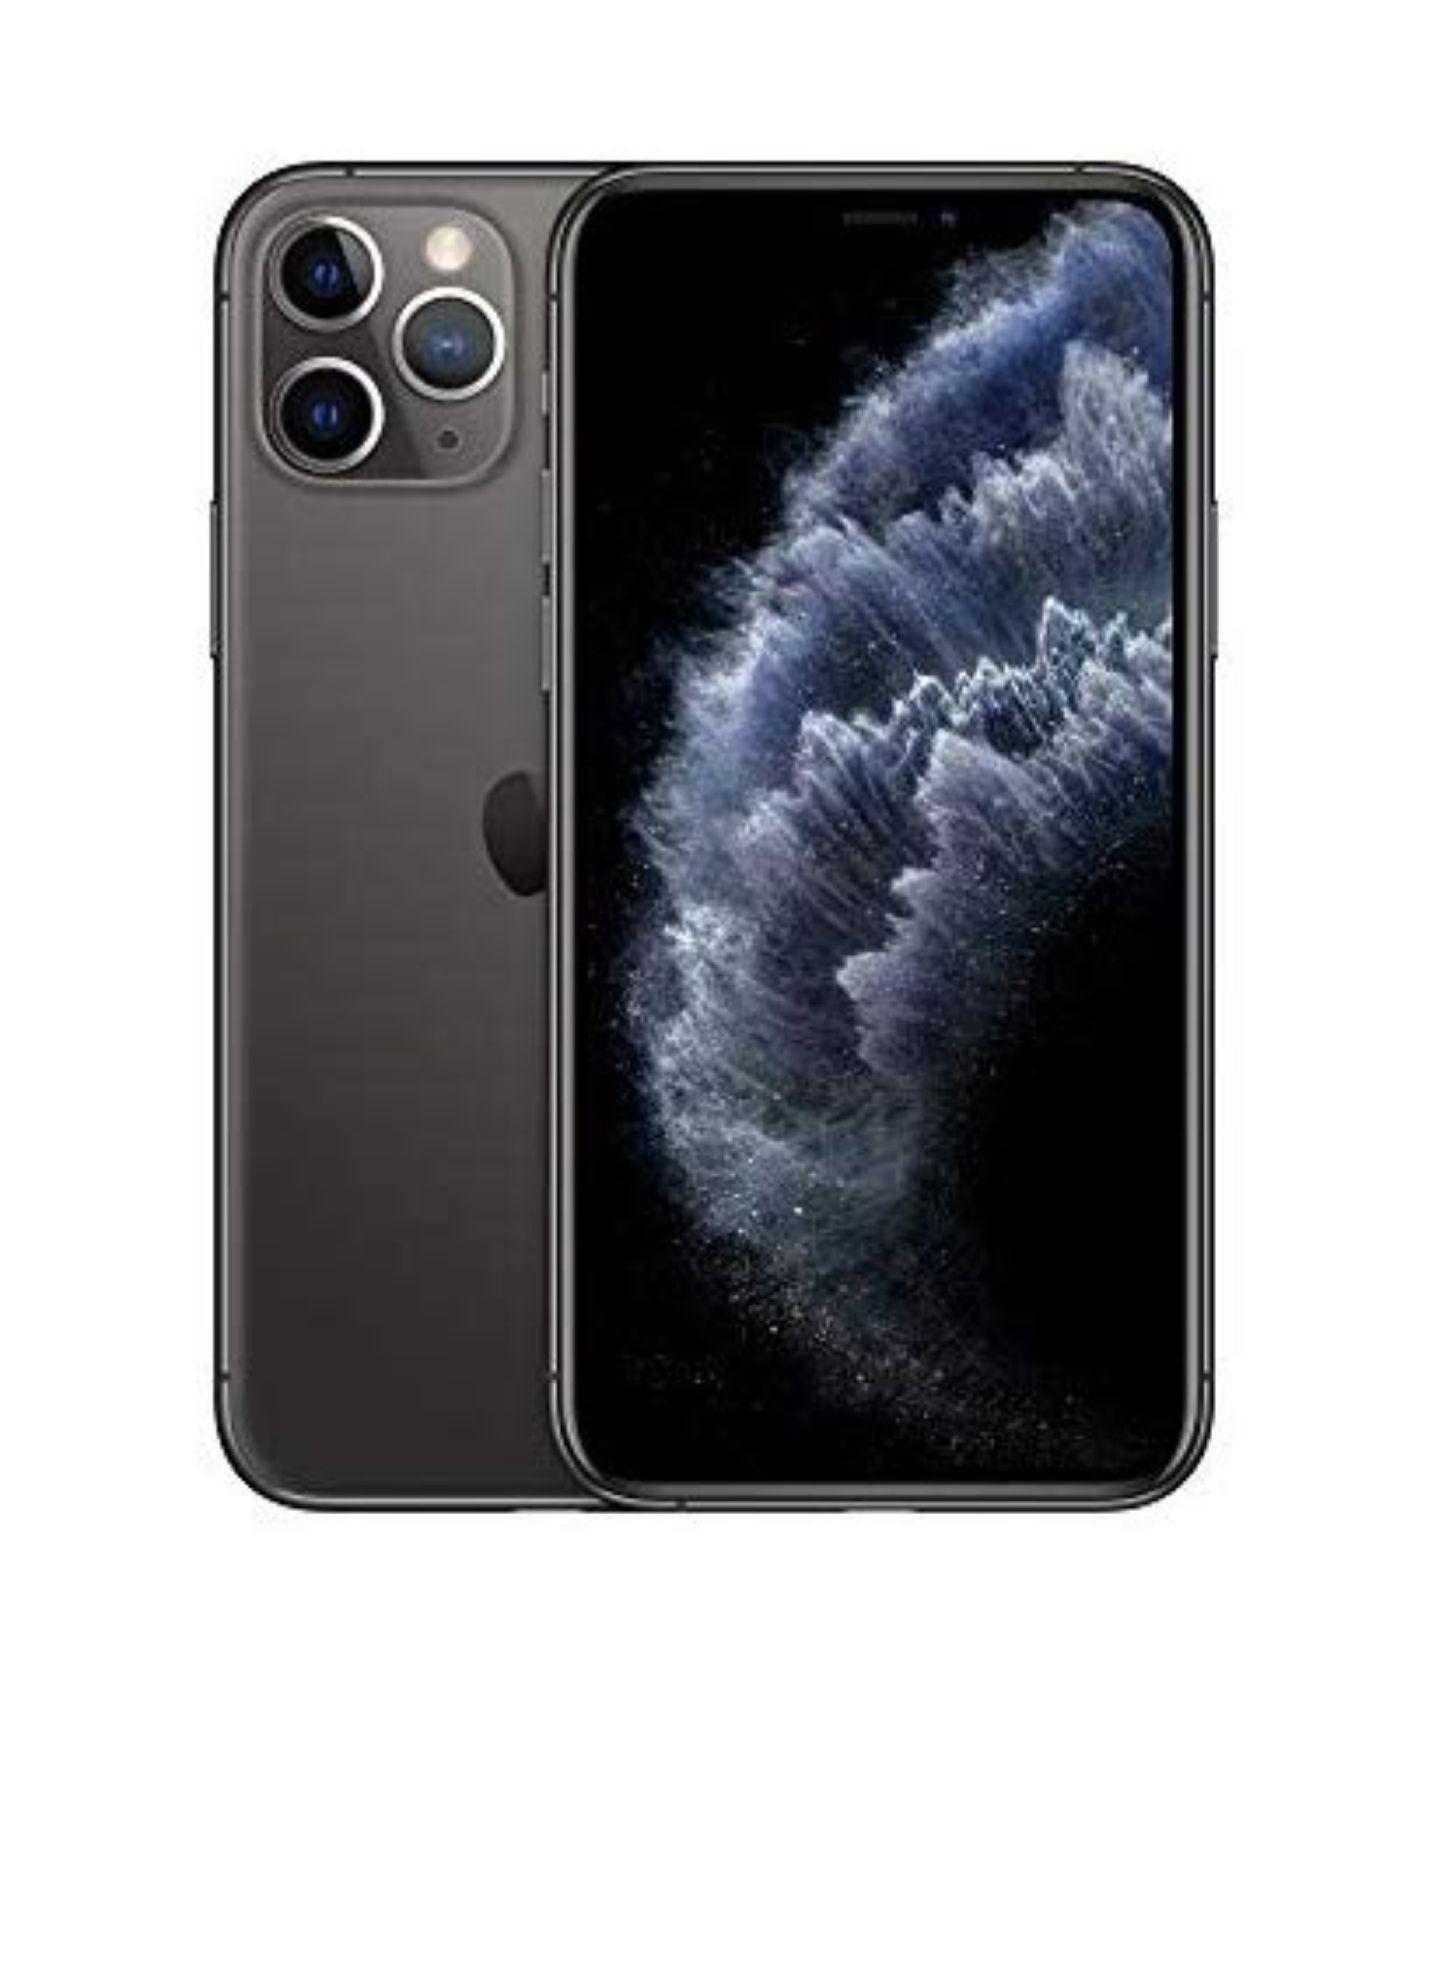 Apple Iphone 11 Pro 64GB ~4372 PLN REVOLUT /AMAZON.IT